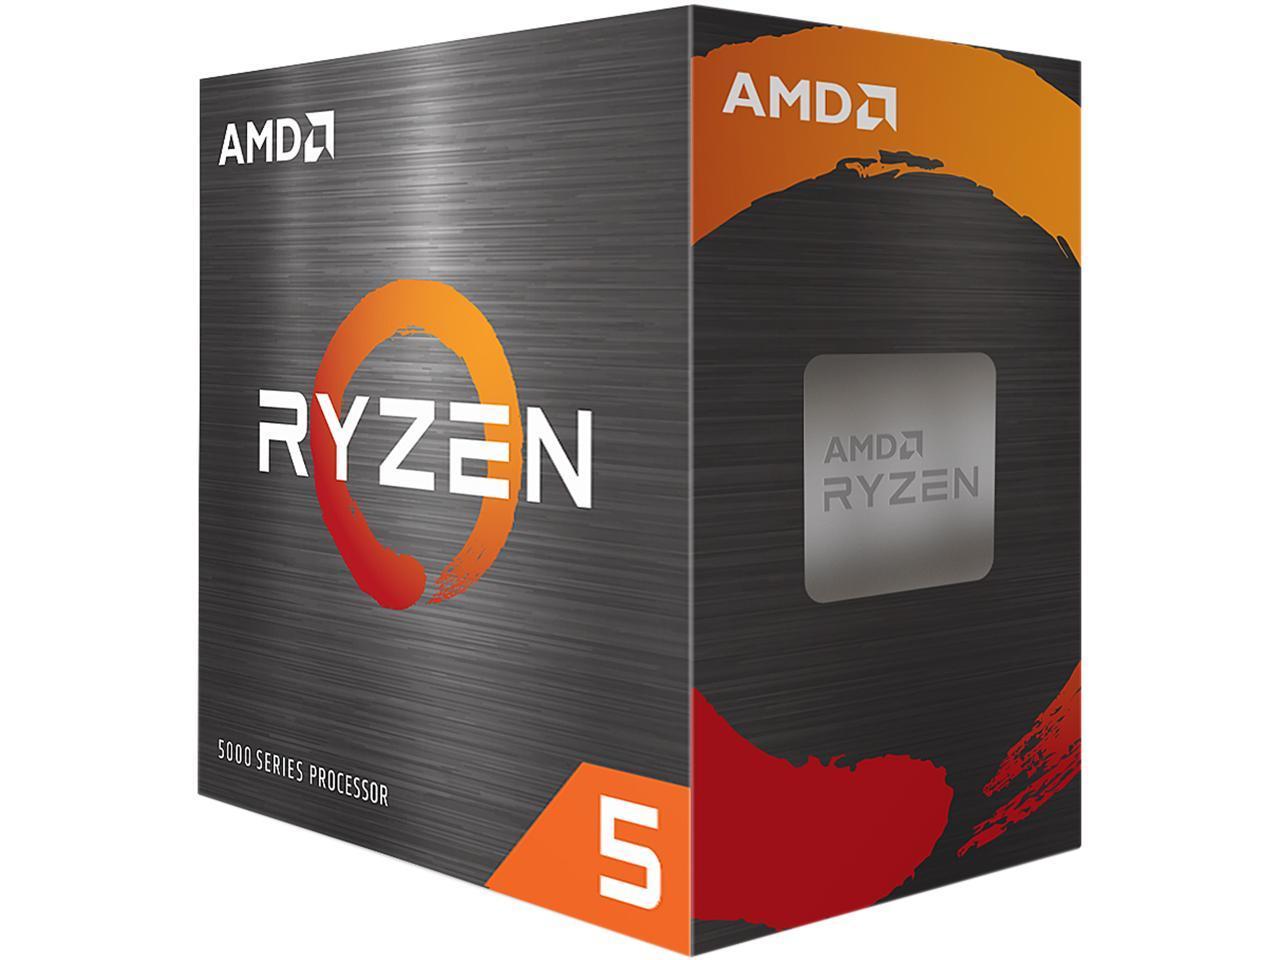 AMD Ryzen 5 5600X 3.7GHz 6-Core AM4 Processor $270 at Newegg